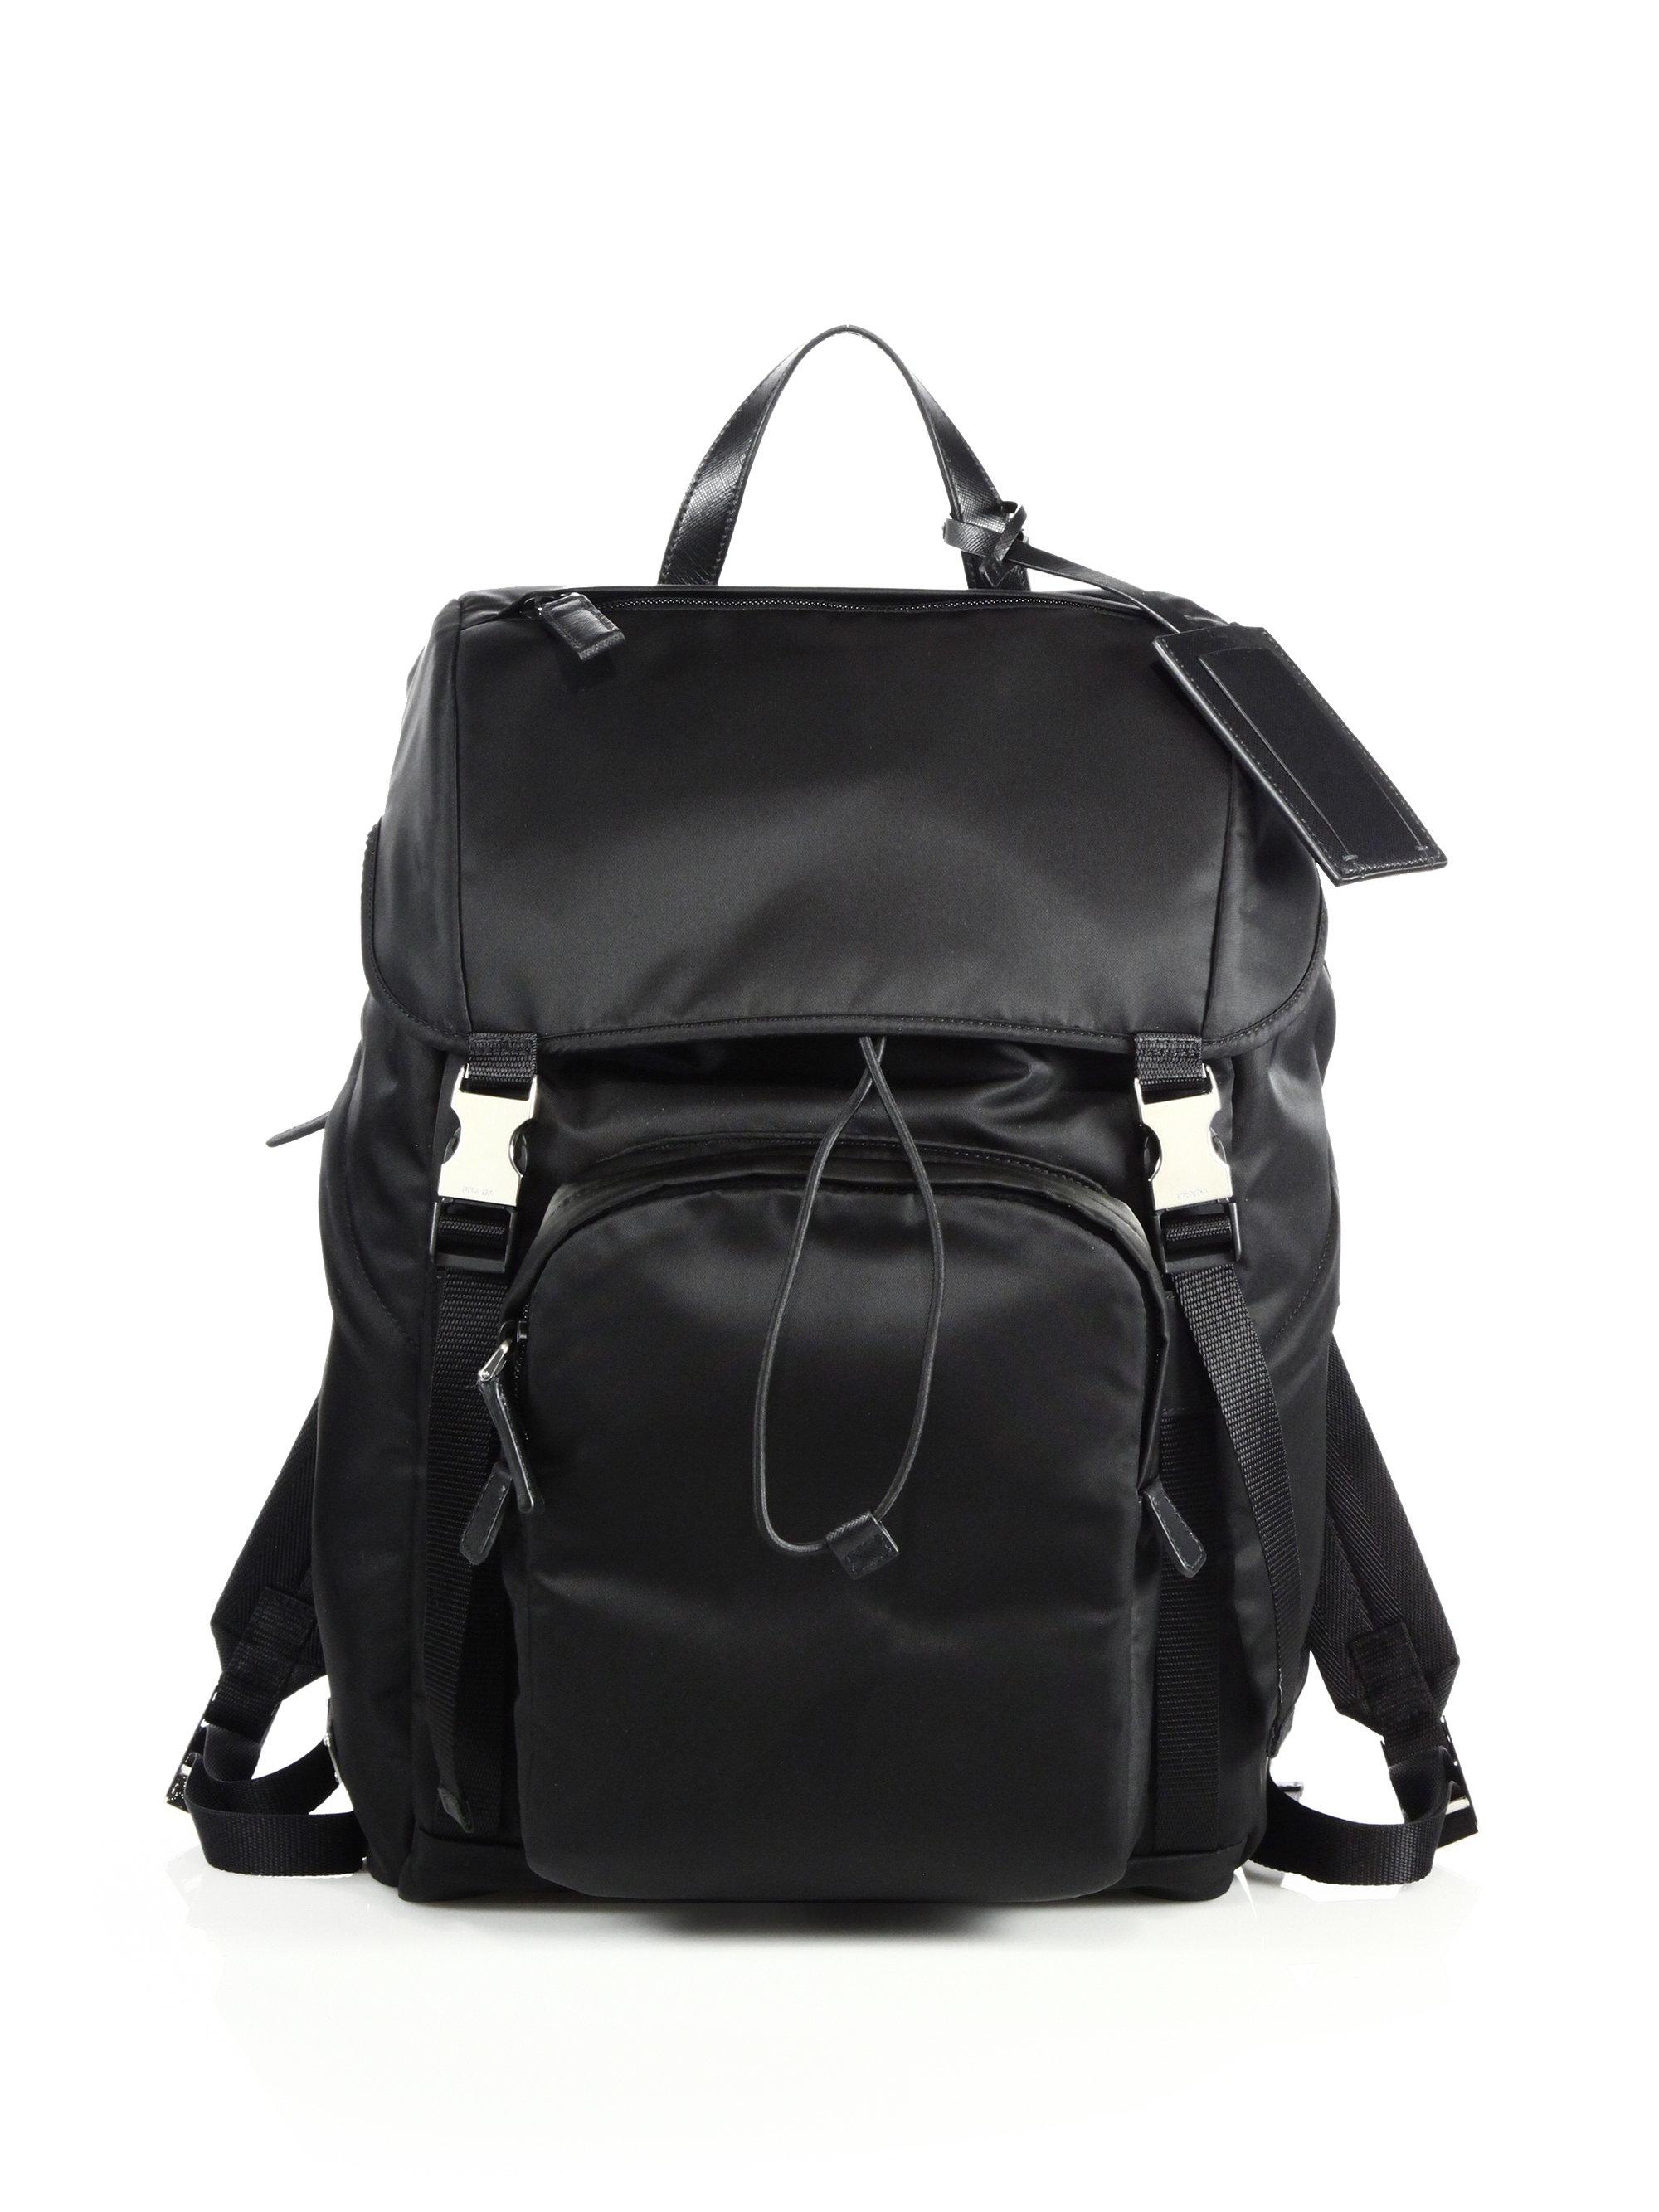 3c7a8a1037c5 Prada Large Tessuto Impunturato Backpack - Bergdorf Goodman. Prada quilted  nylon backpack with leather trim.